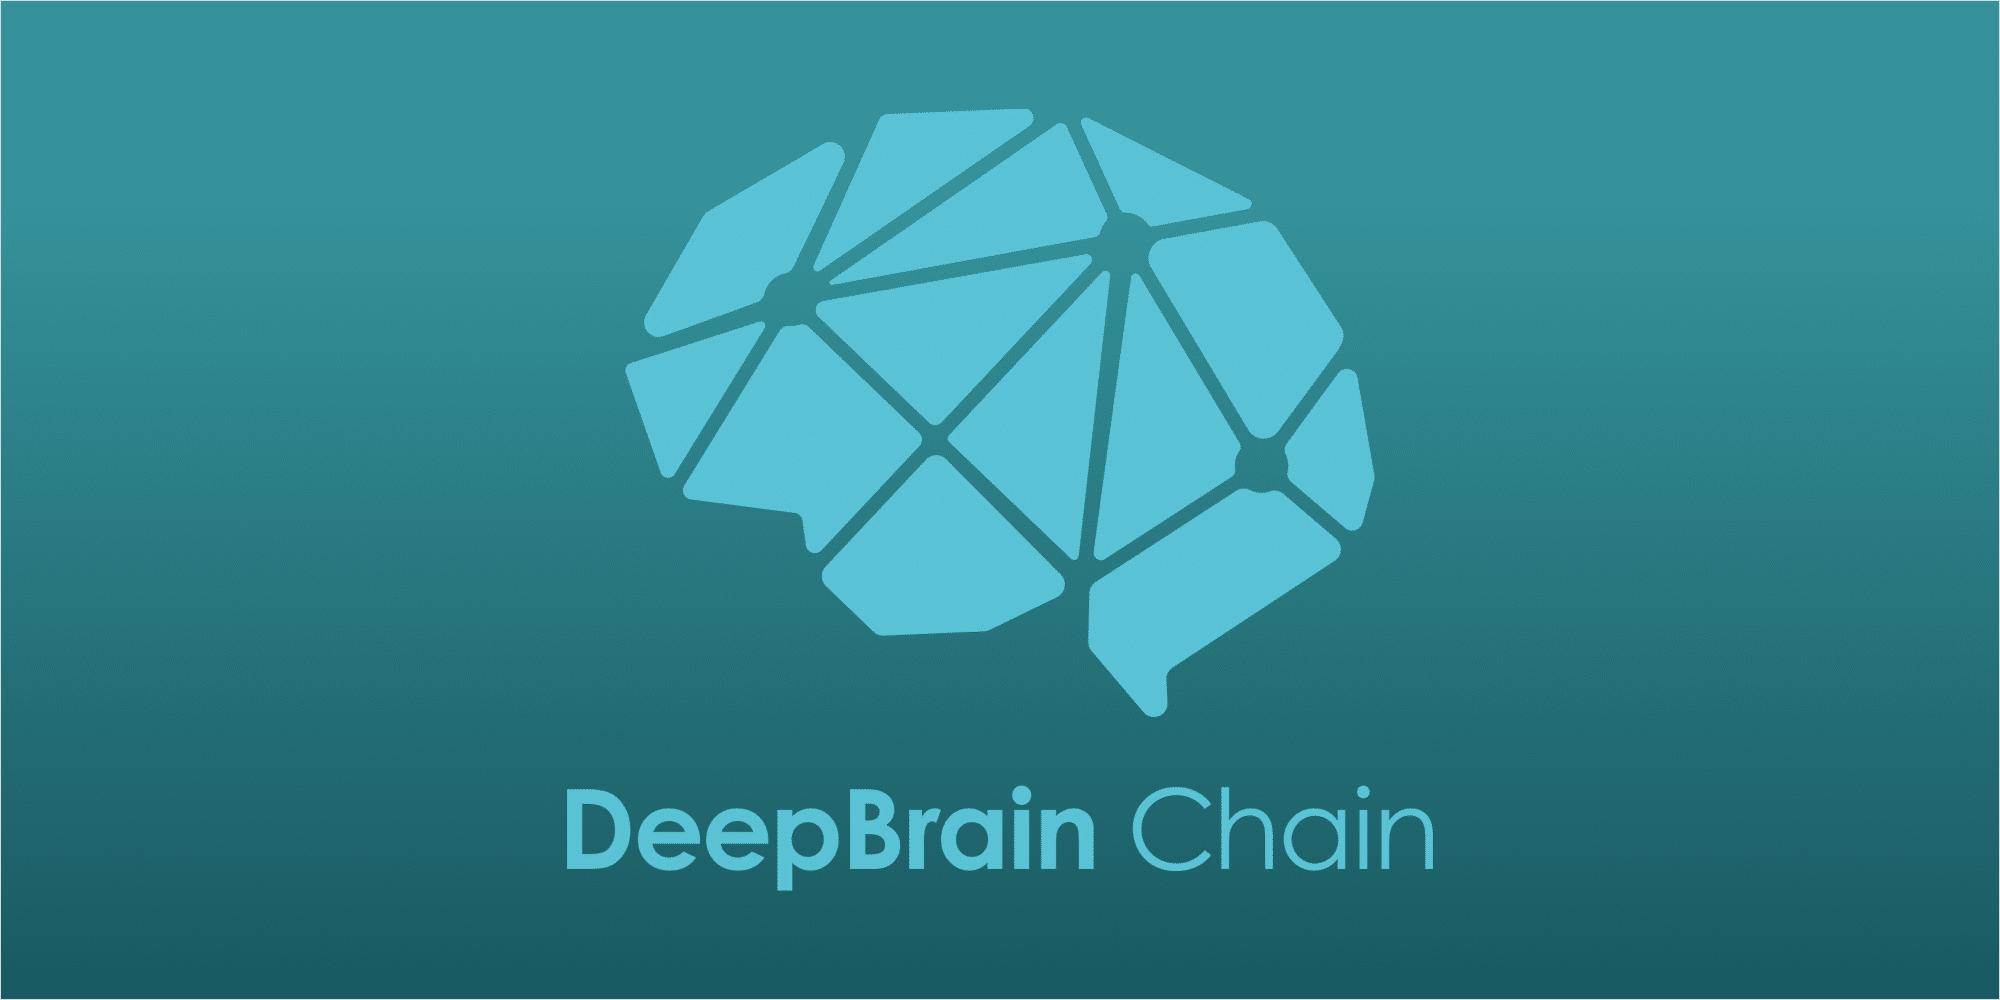 DBC DeepBrain Chain